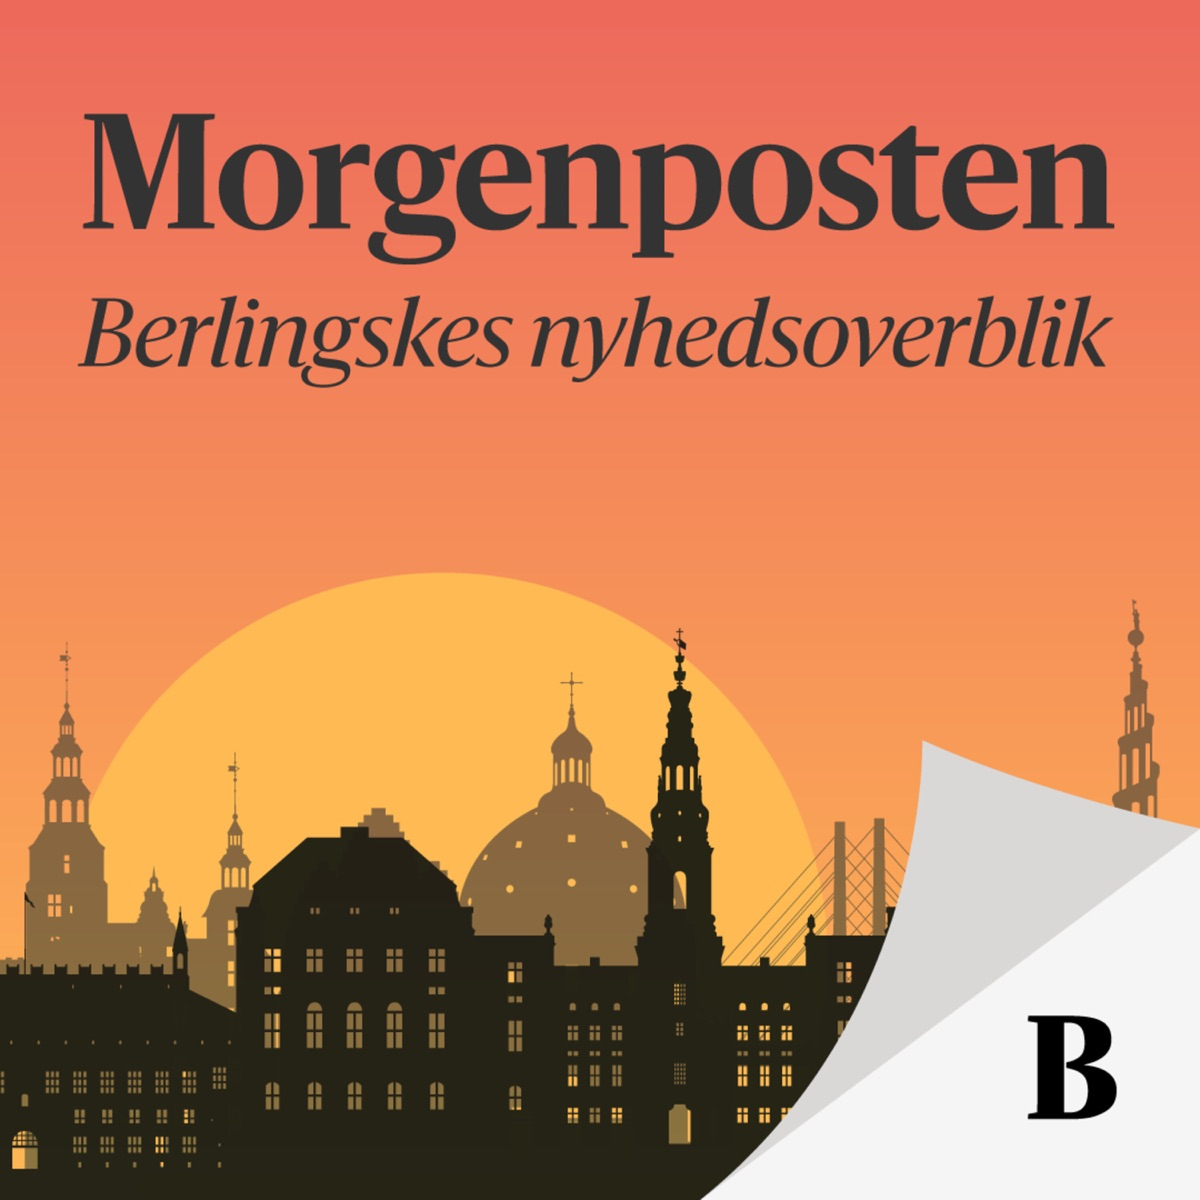 Morgenposten – Berlingskes nyhedsoverblik